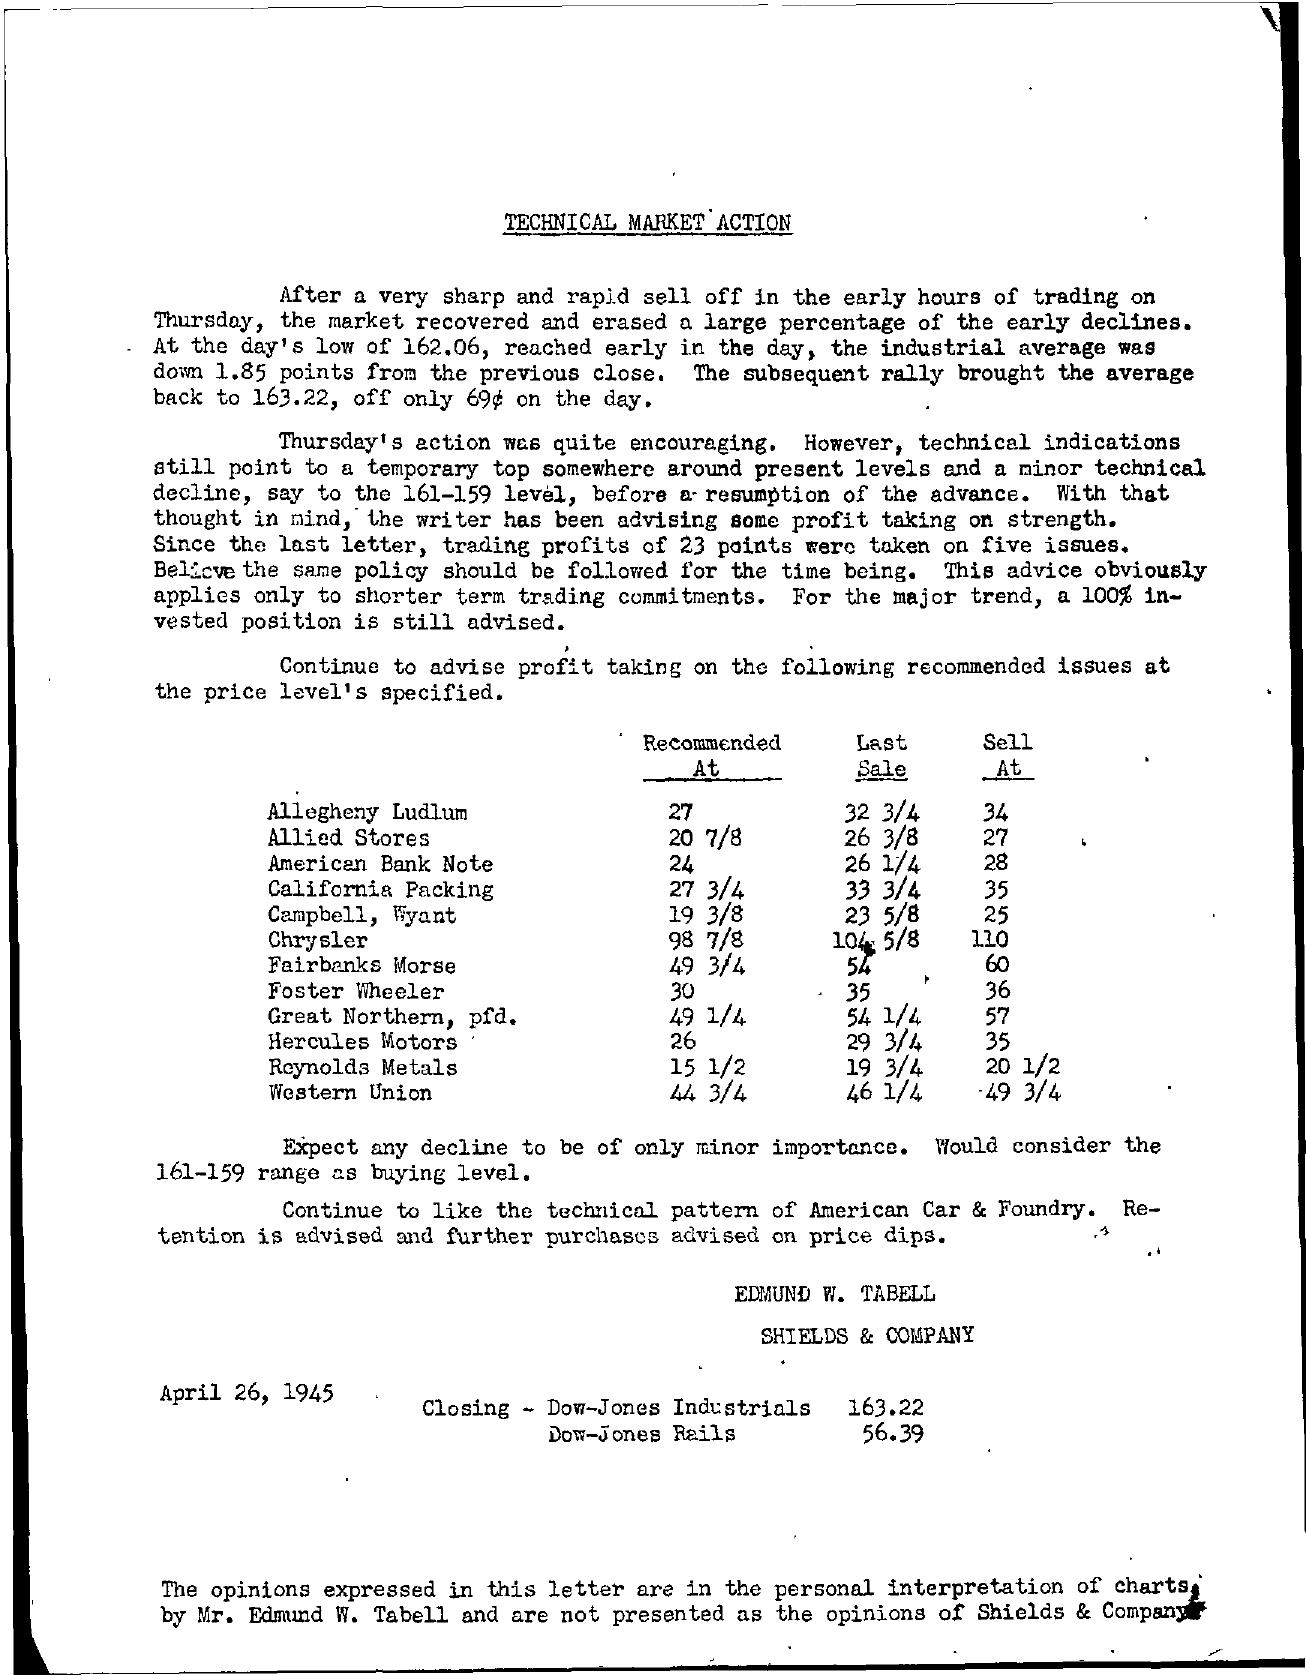 Tabell's Market Letter - April 26, 1945